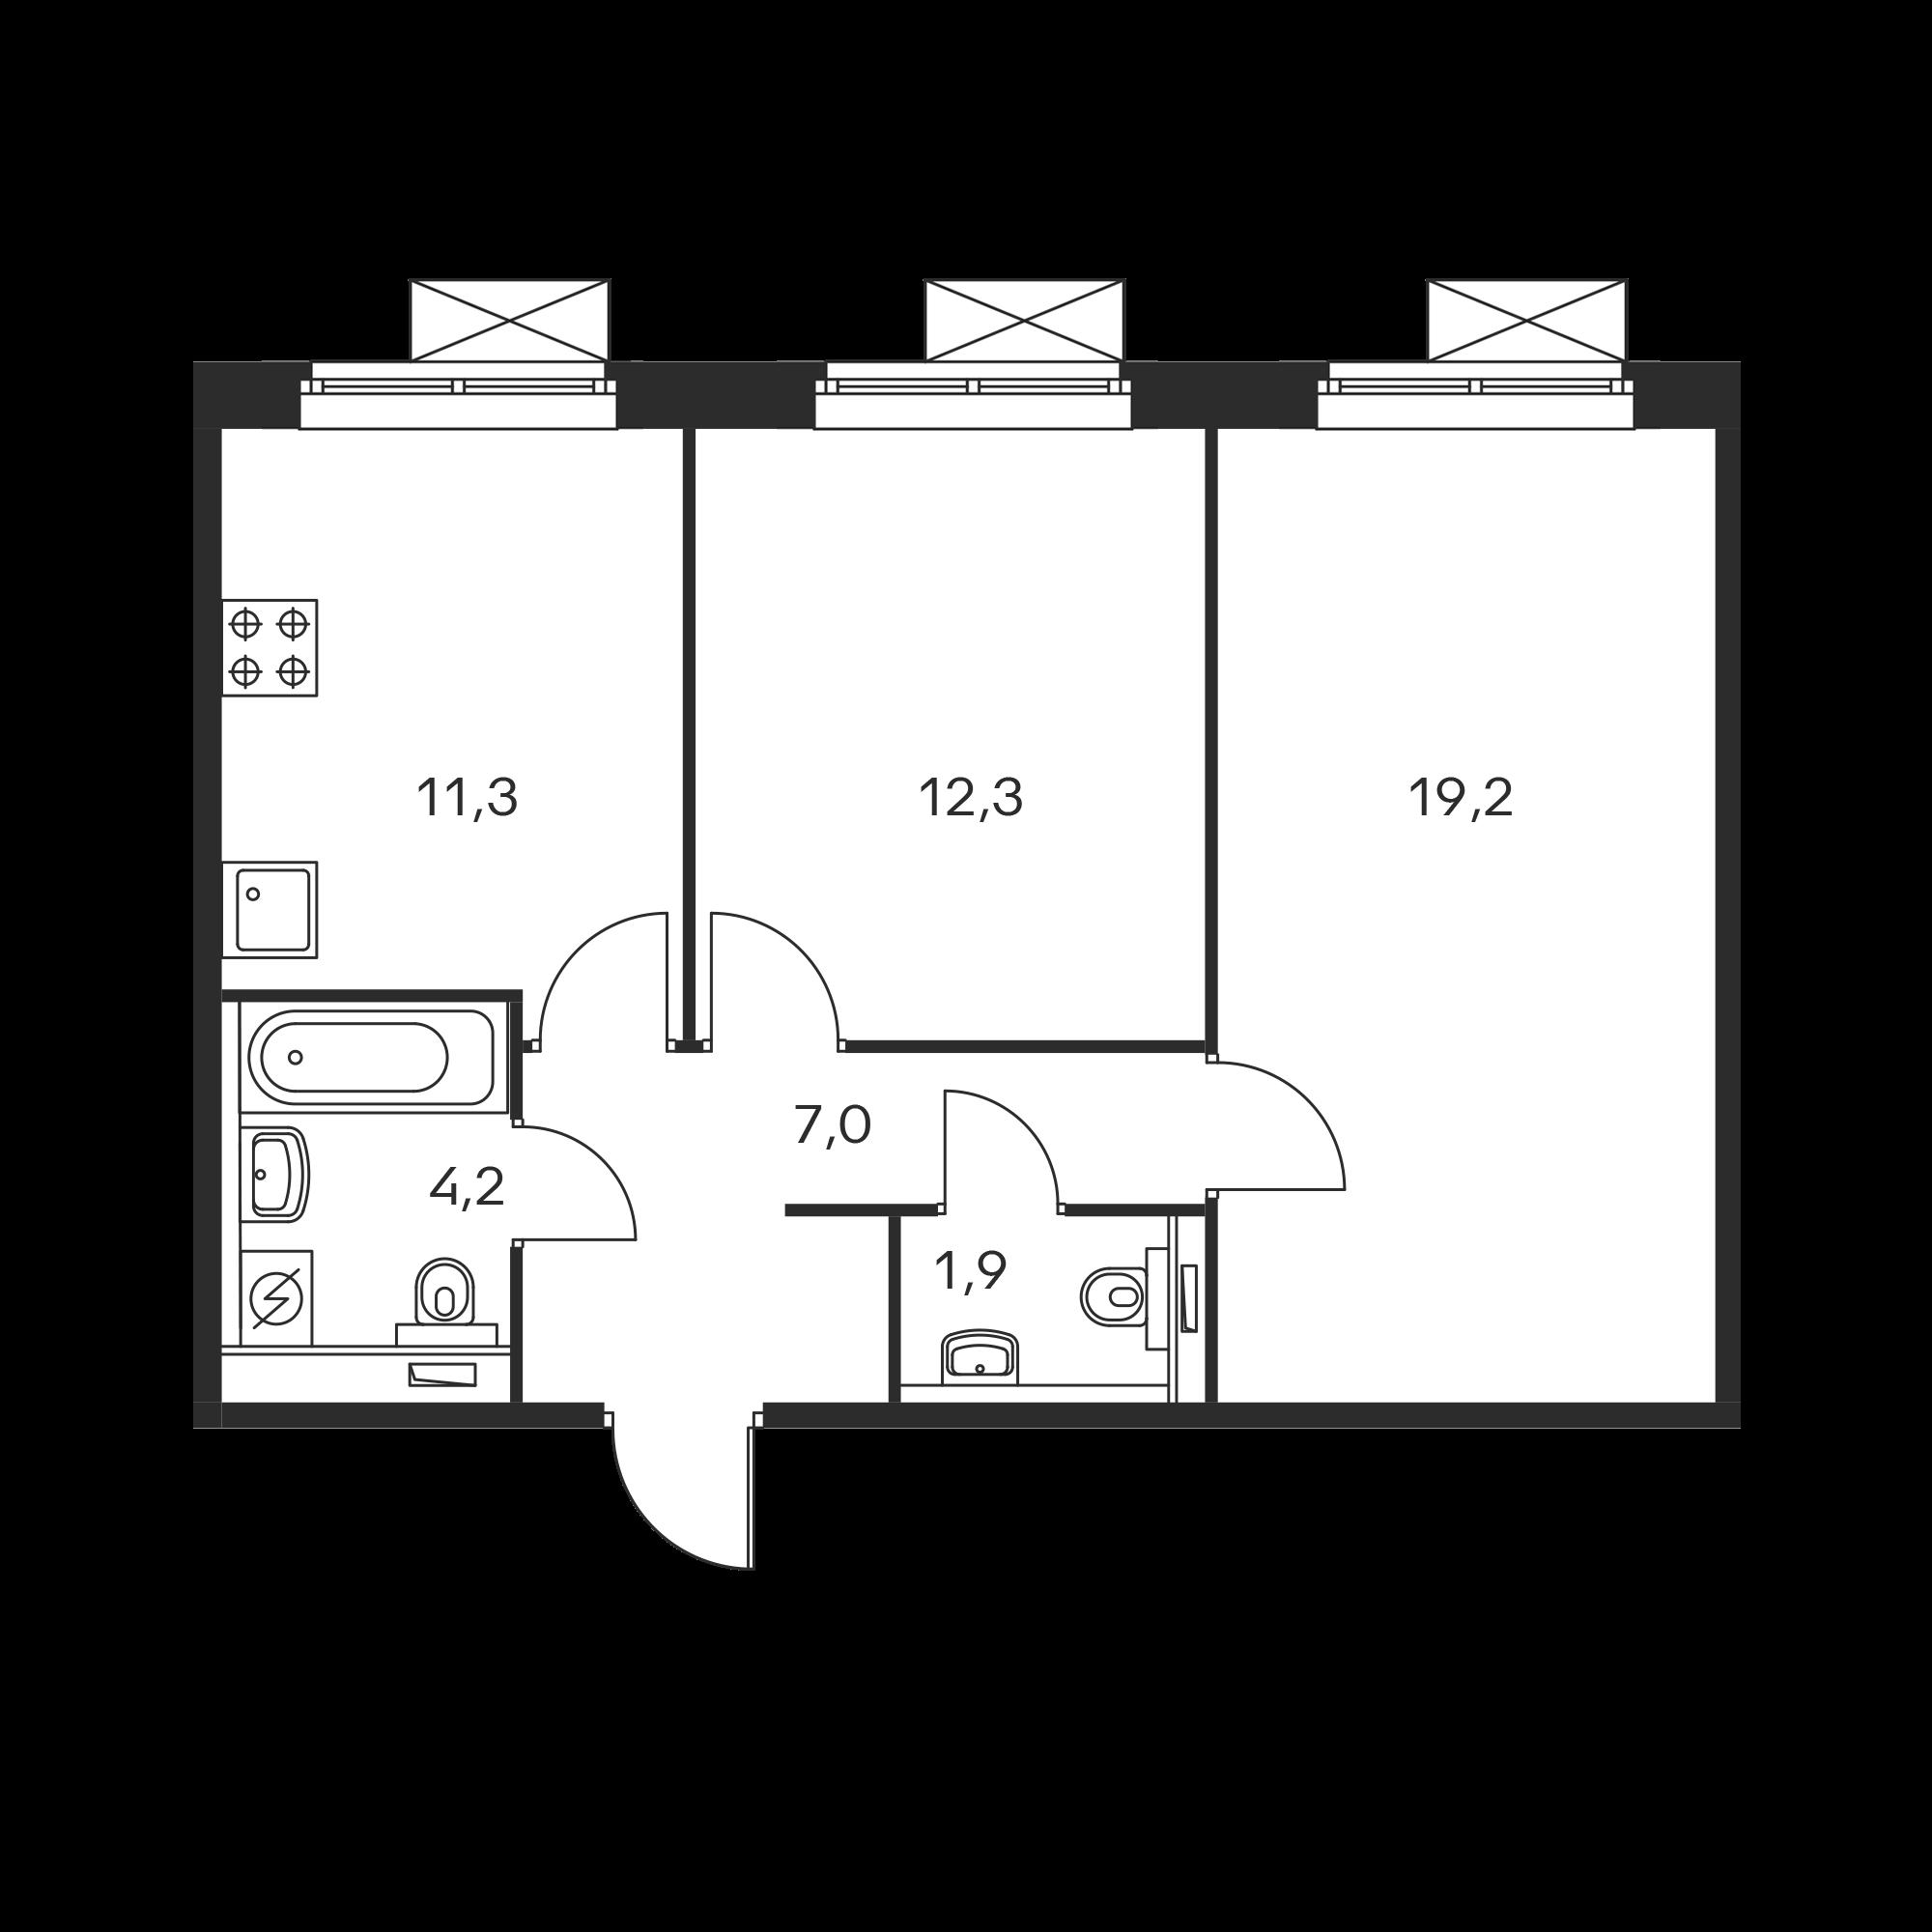 2KS6_9.6-3